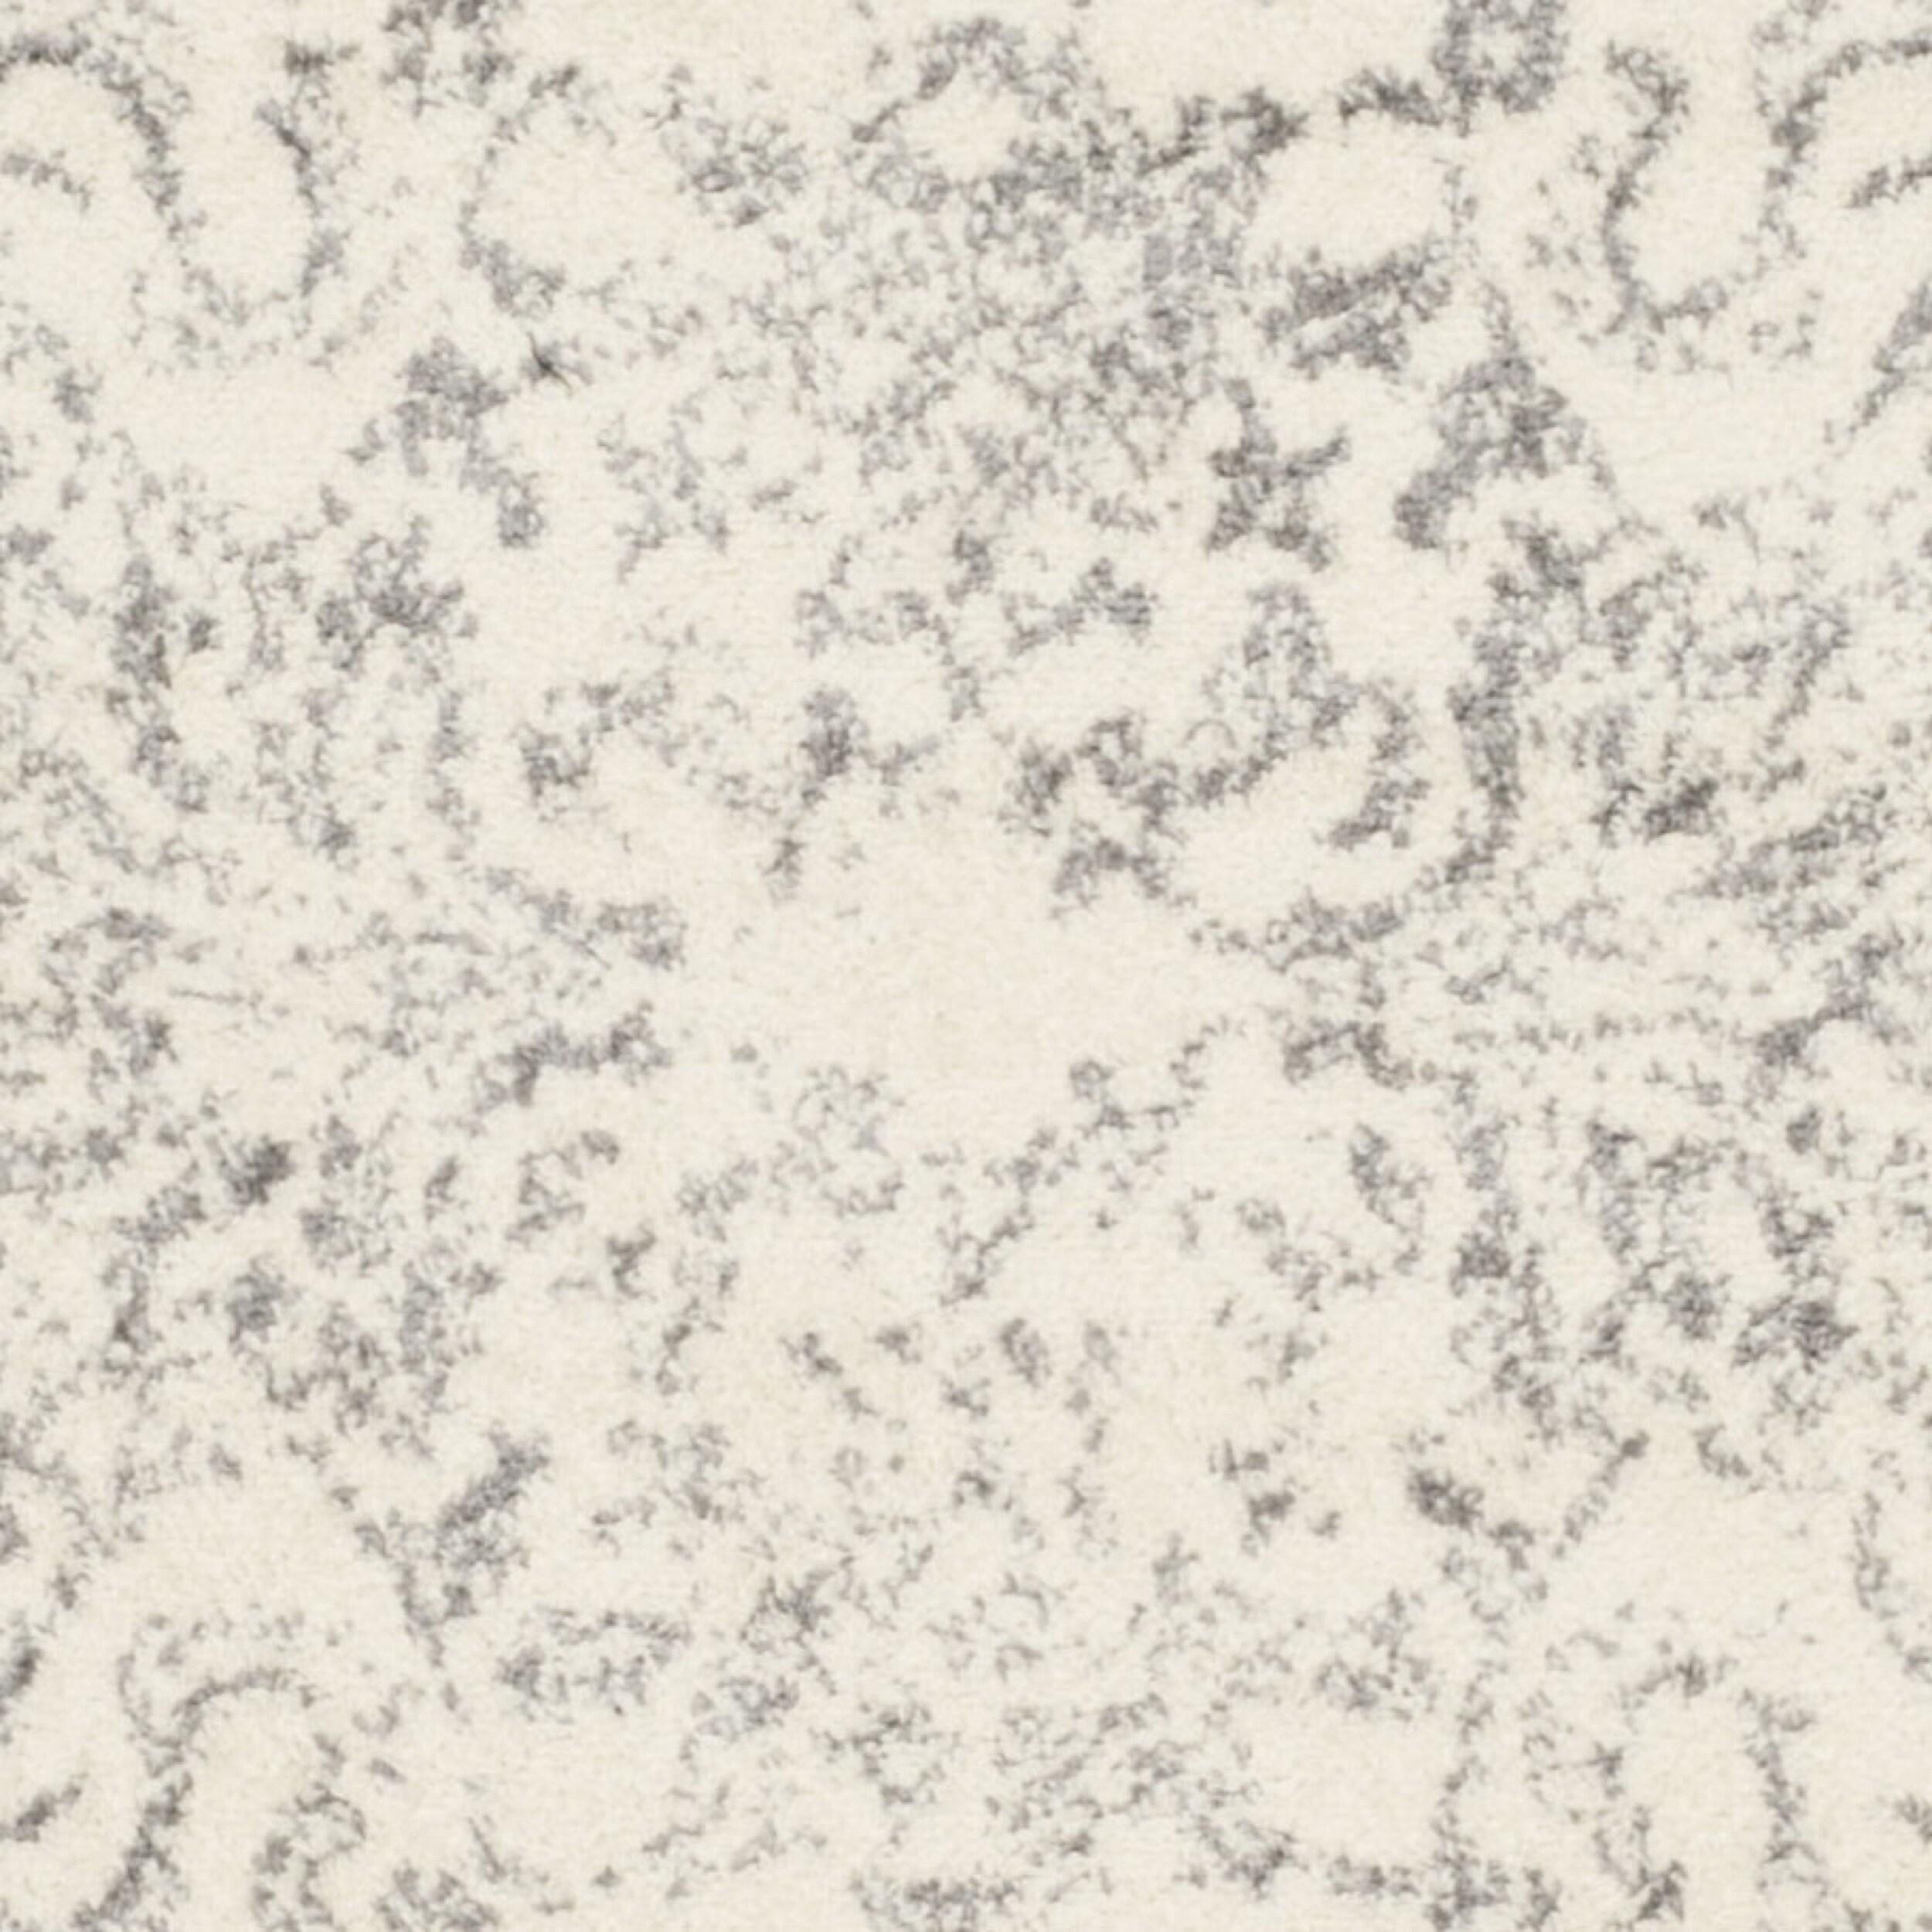 Must see Wallpaper Marble Silver - Safavieh-Adirondack-Ivory-Silver-Rug-11-x-15-5362830a-1ad1-48e1-991d-13daaaab6be5  HD_51671.jpg